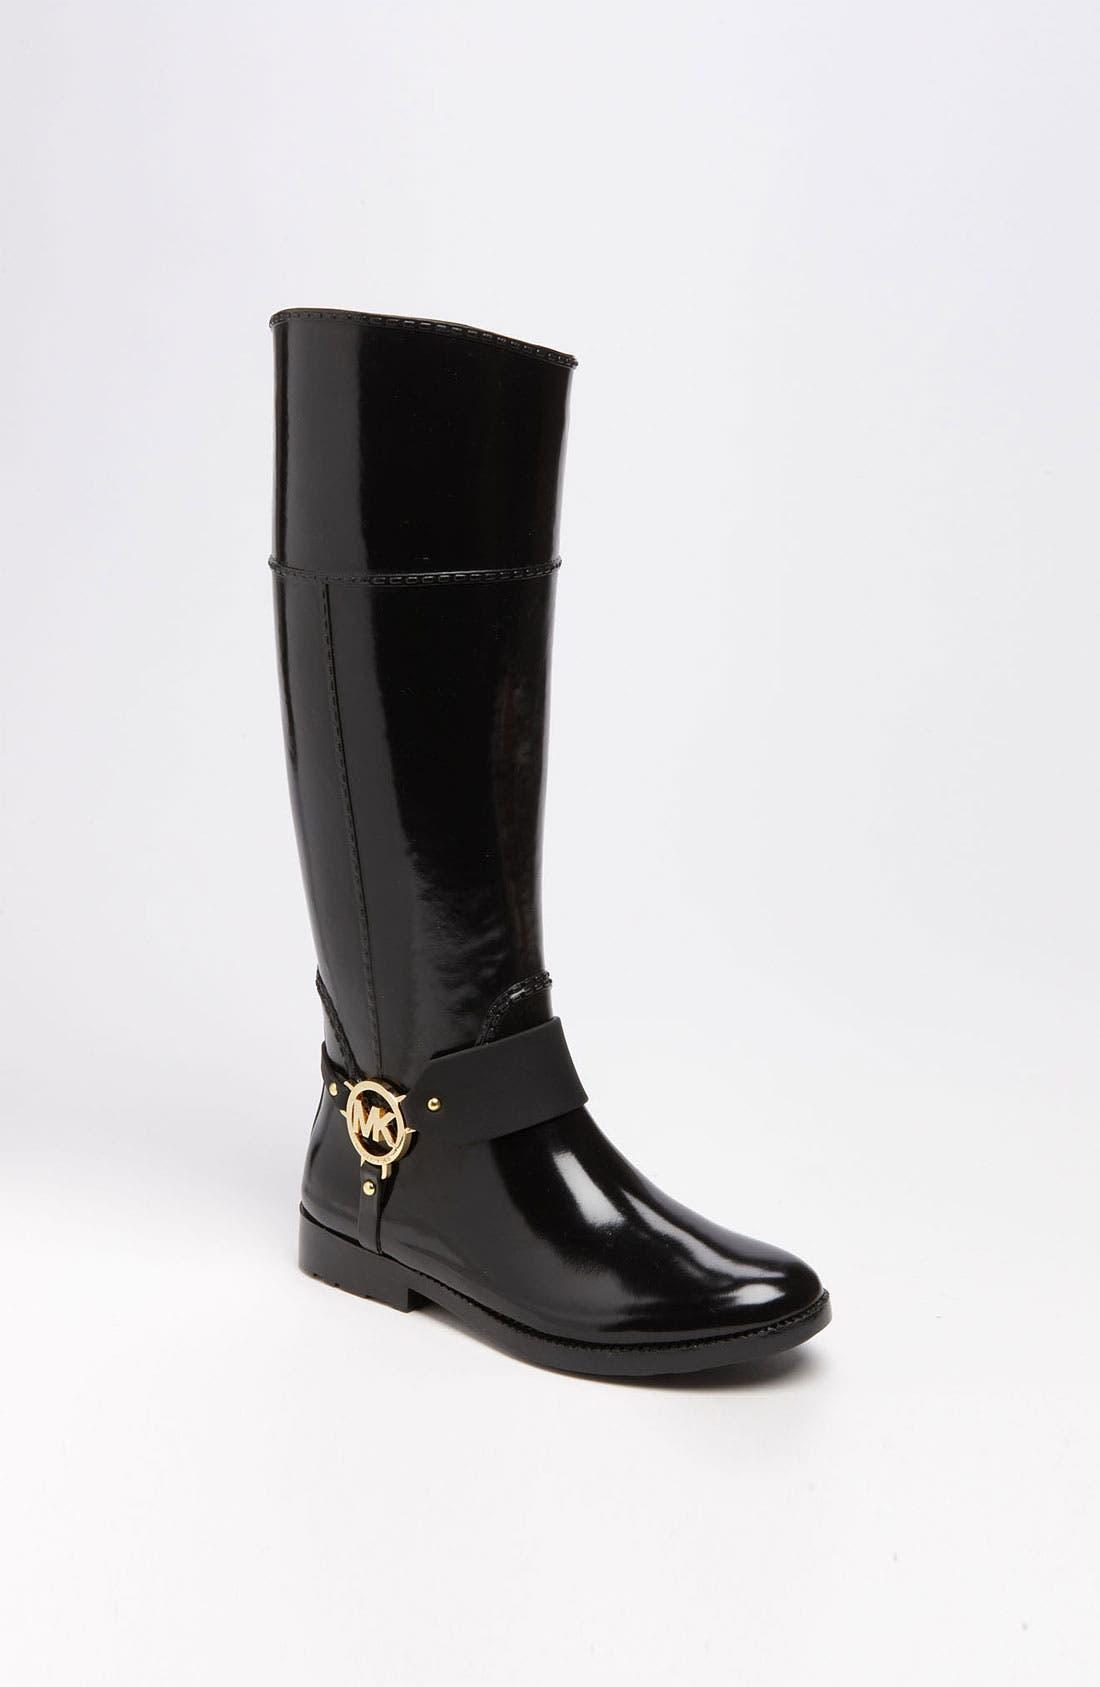 Alternate Image 1 Selected - MICHAEL Michael Kors 'Fulton' Rain Boot (Women)